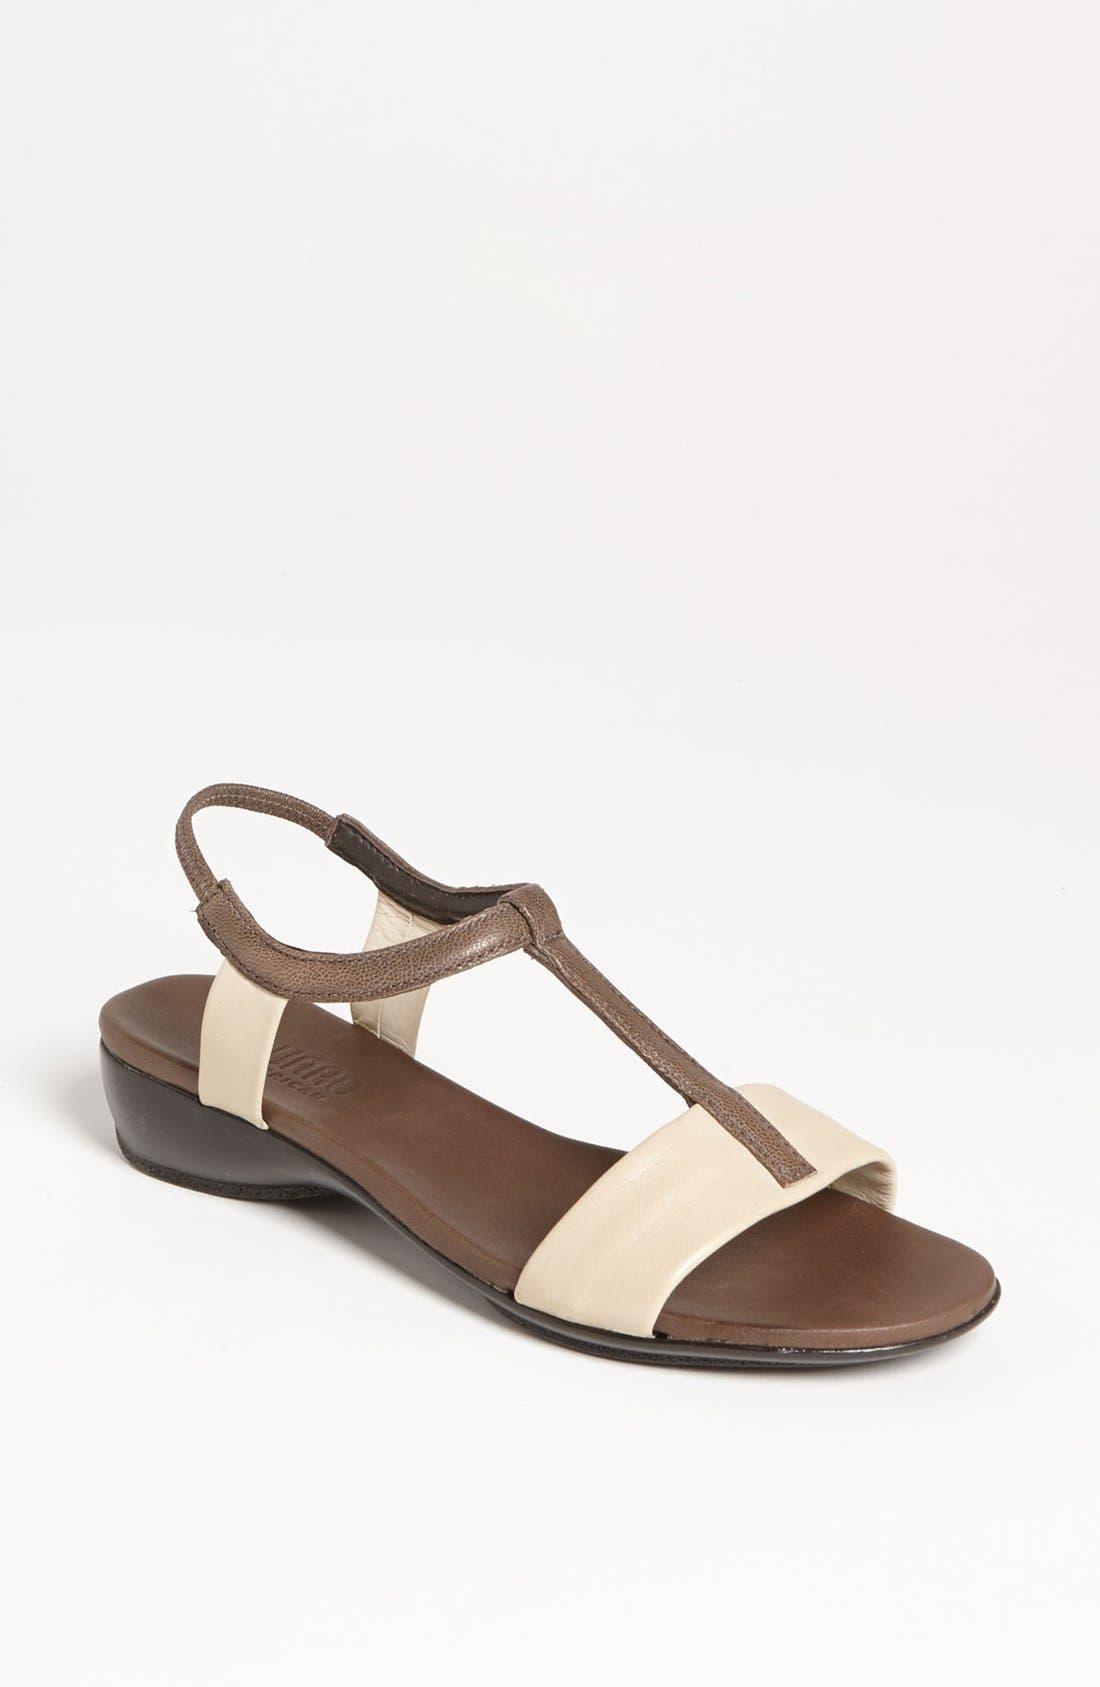 Main Image - Munro 'Faran' Sandal (Special Purchase)